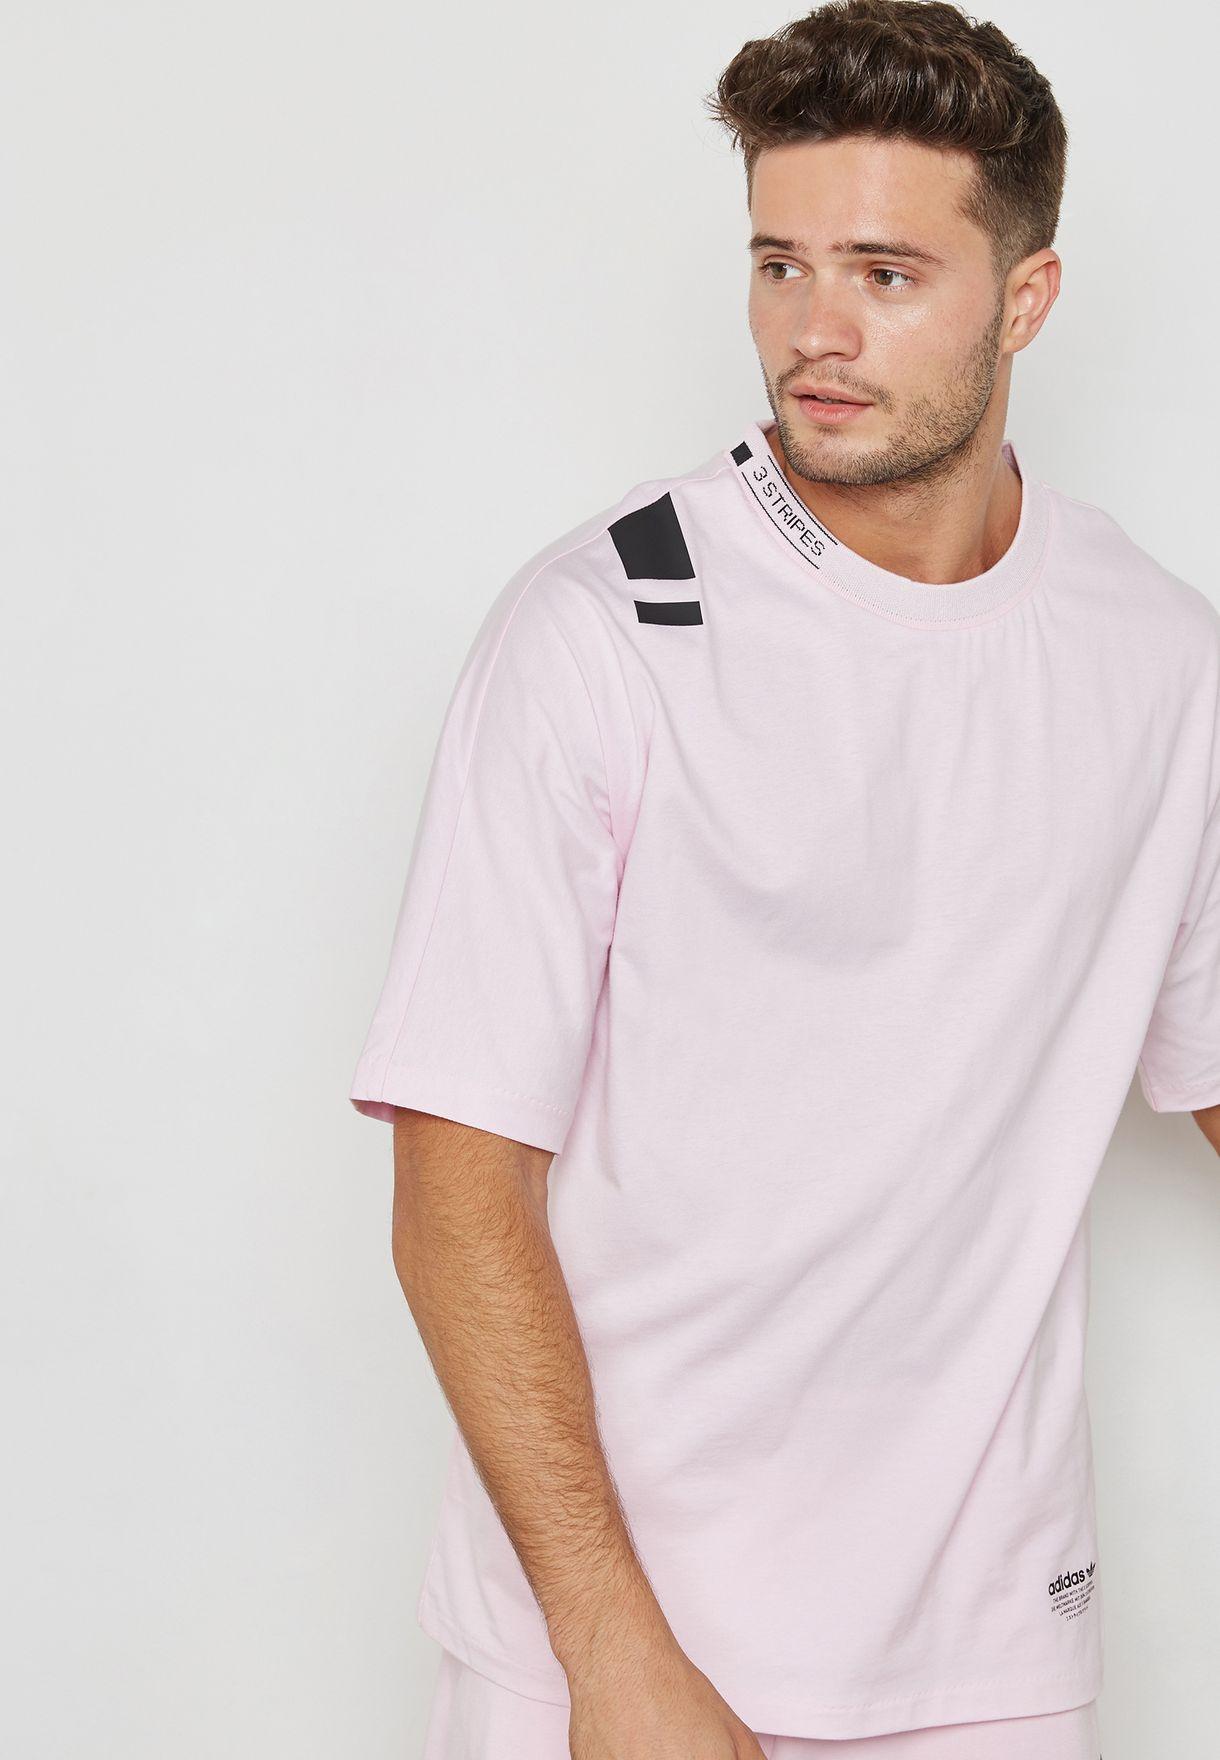 Shop adidas Originals pink NMD T-Shirt CV5812 for Men in Kuwait -  AD478AT81EXU e7957d29ca66